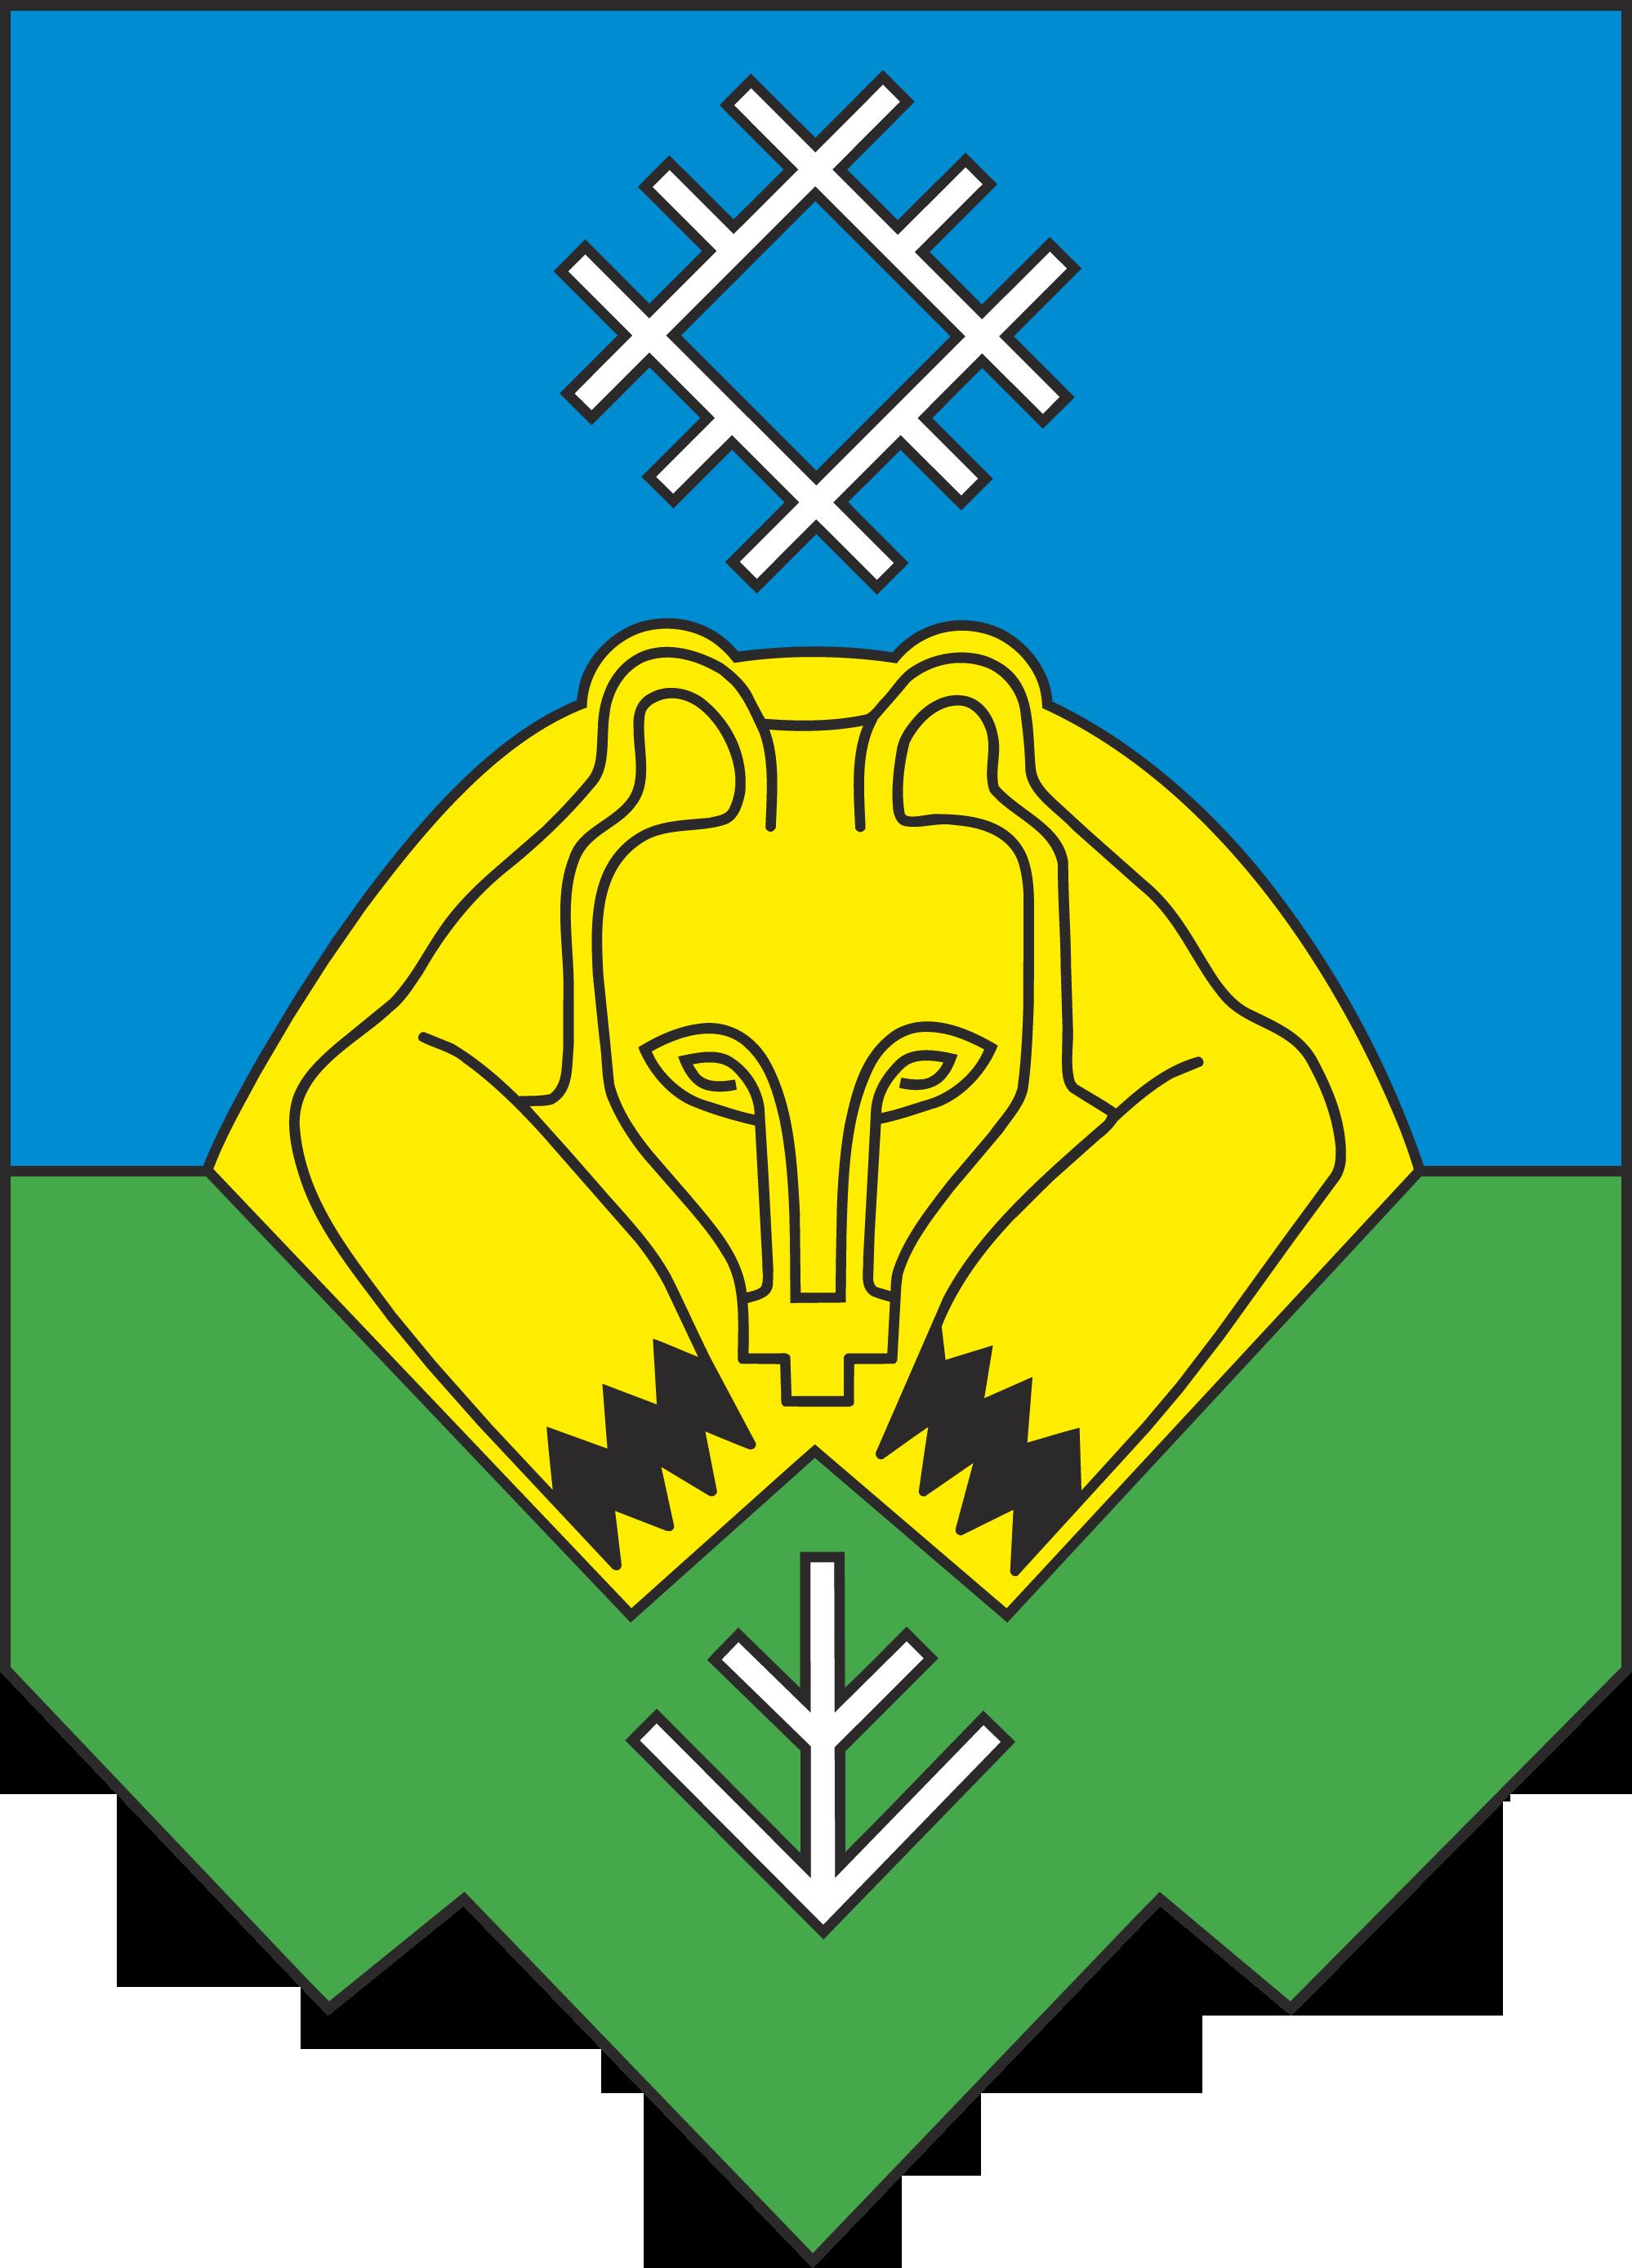 герб города Сыктывкар